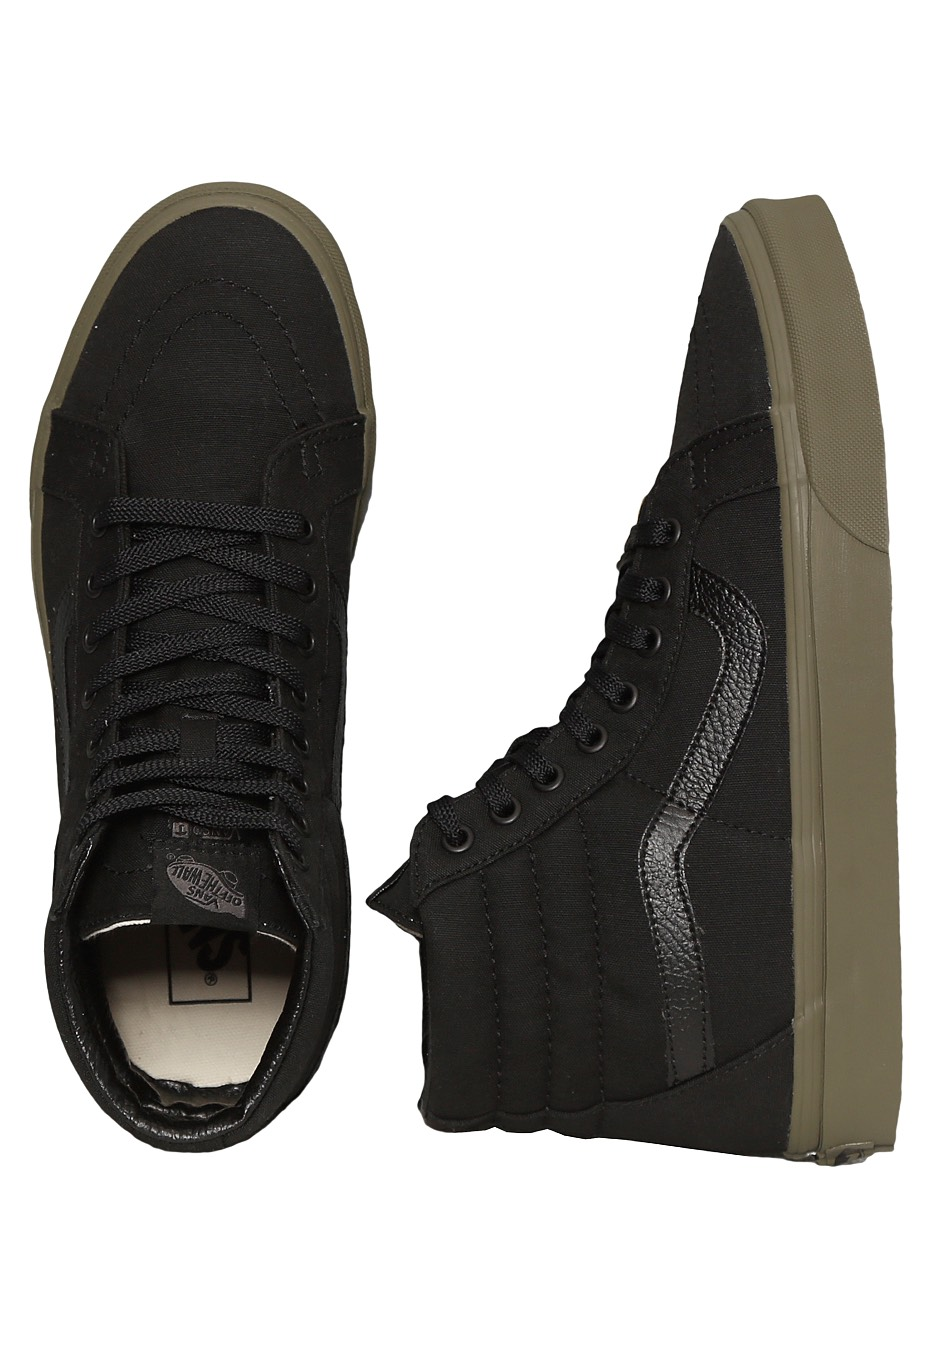 Vans - Sk8-Hi Reissue Vansguard Black Ivy Green - Shoes - Impericon.com  Worldwide e7292ad75d